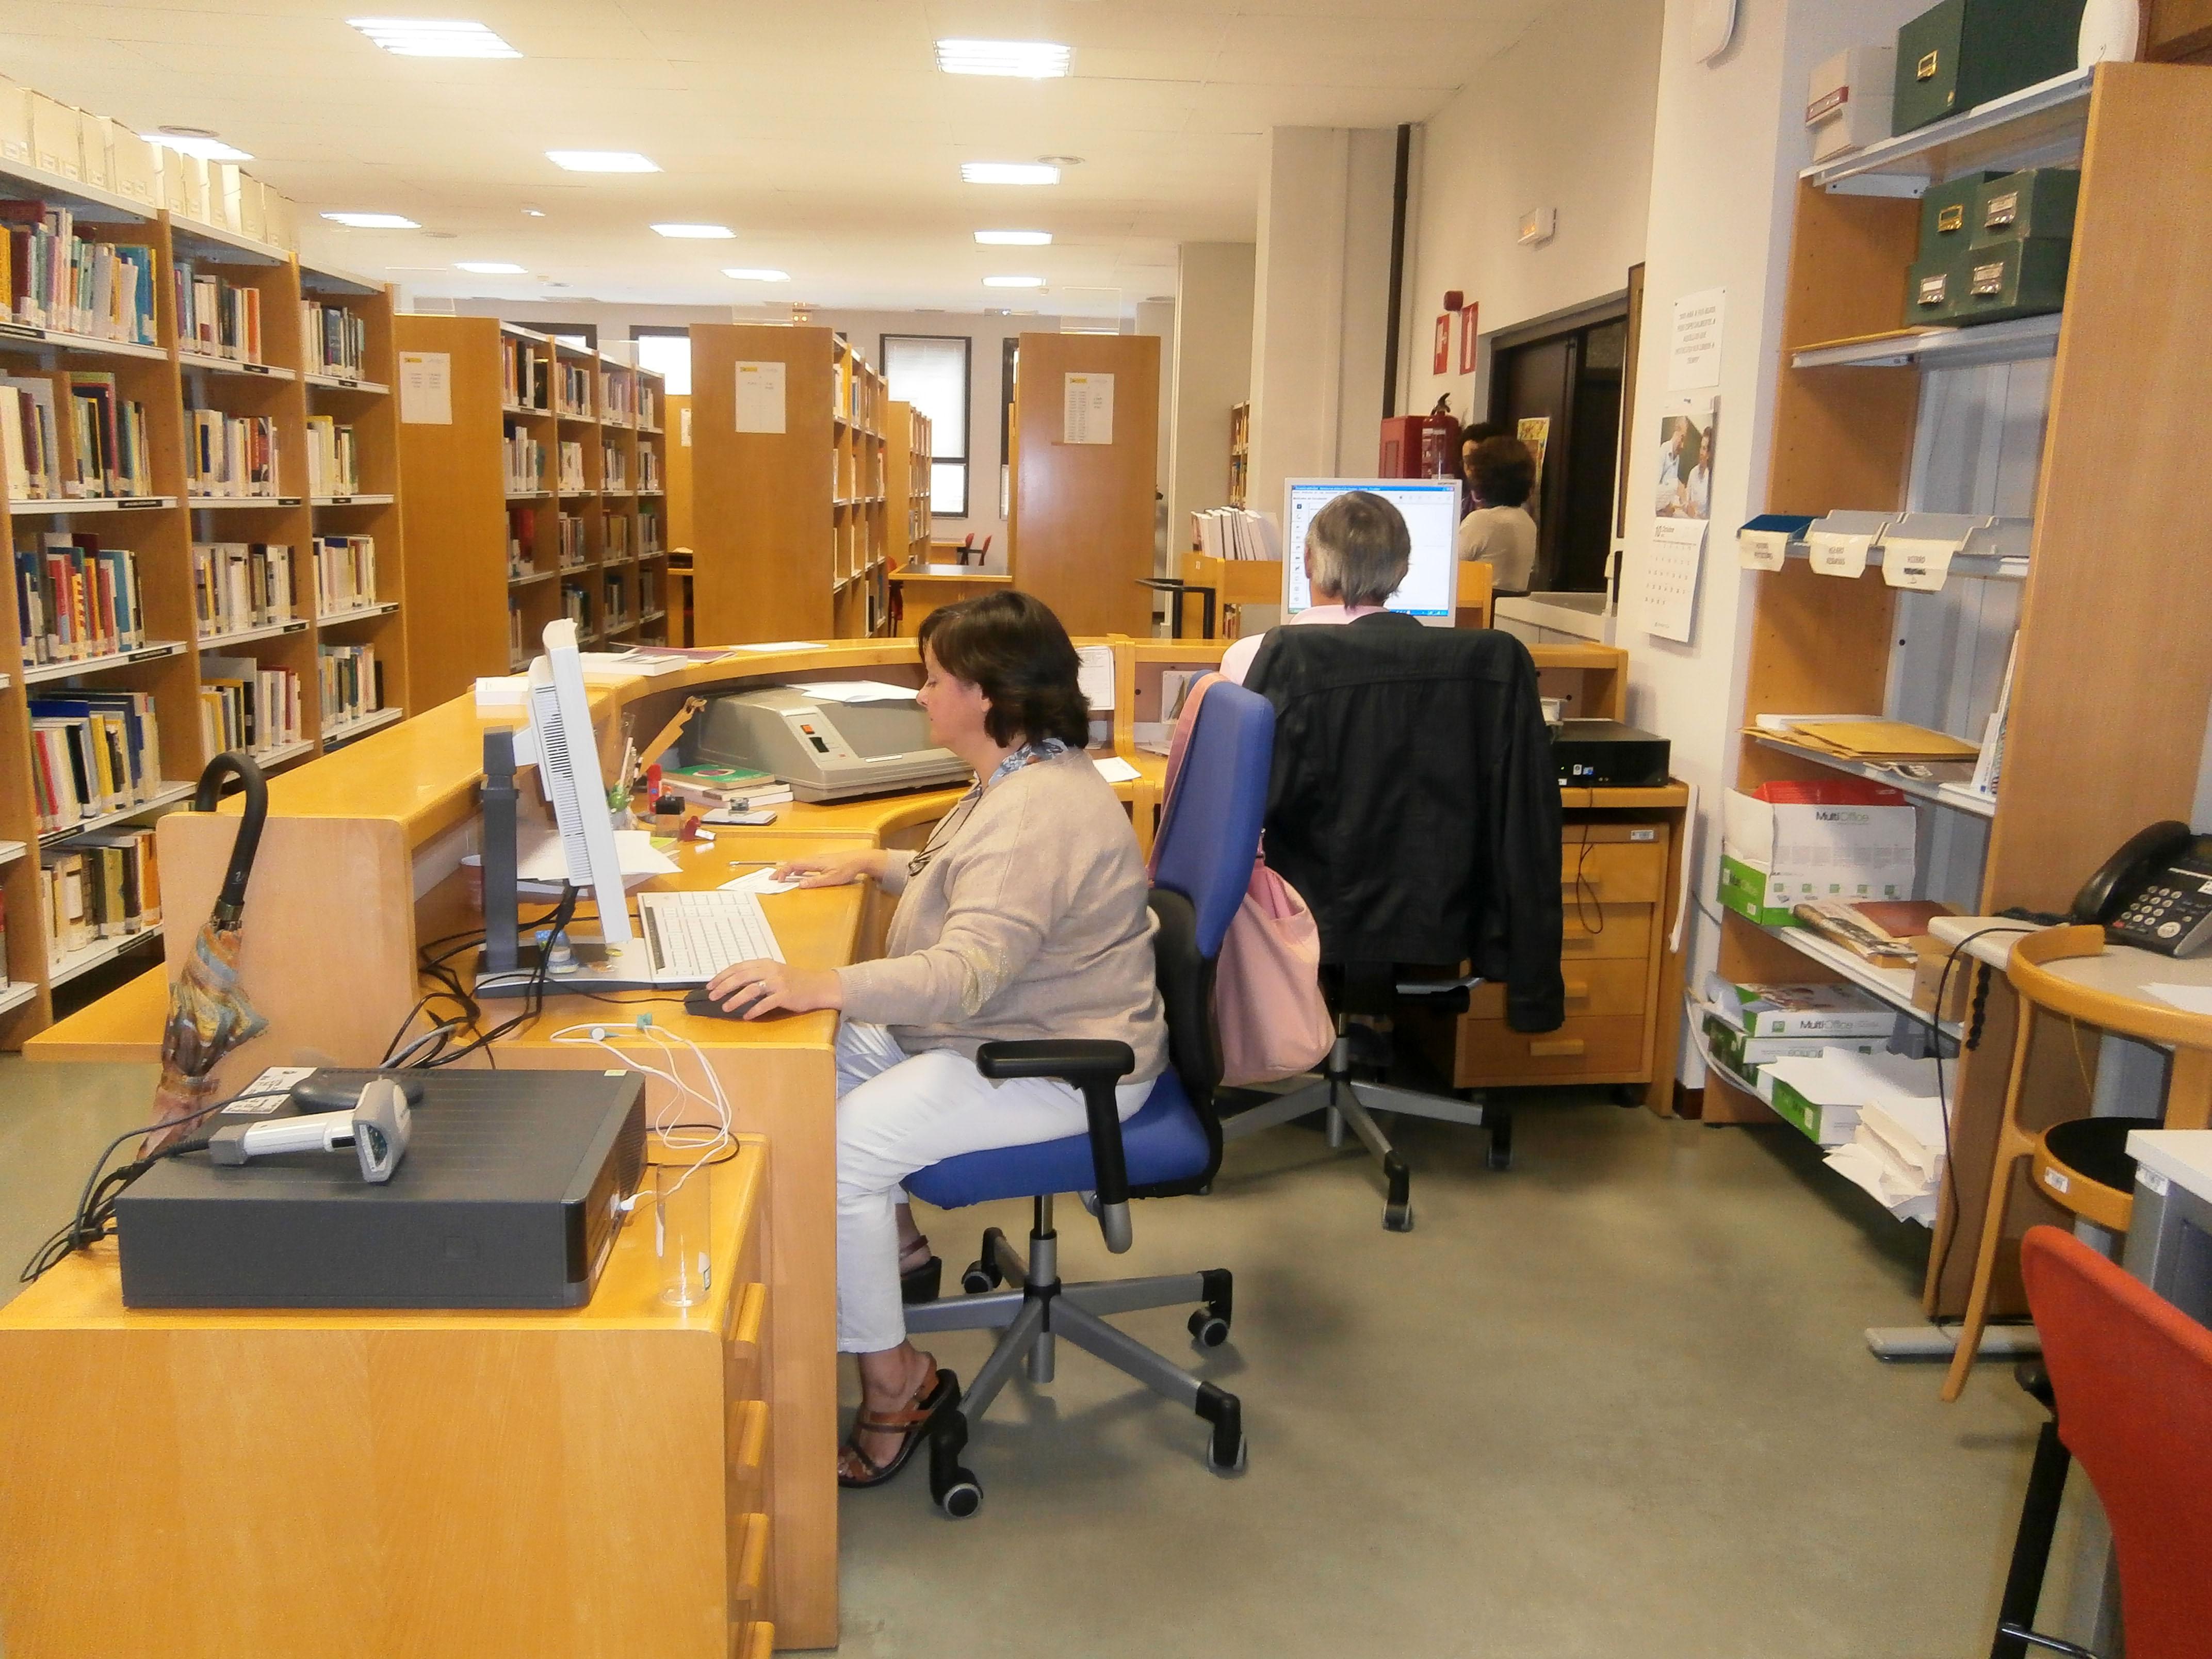 Mostrador Biblioteca Ministerio Educación2013/10/15